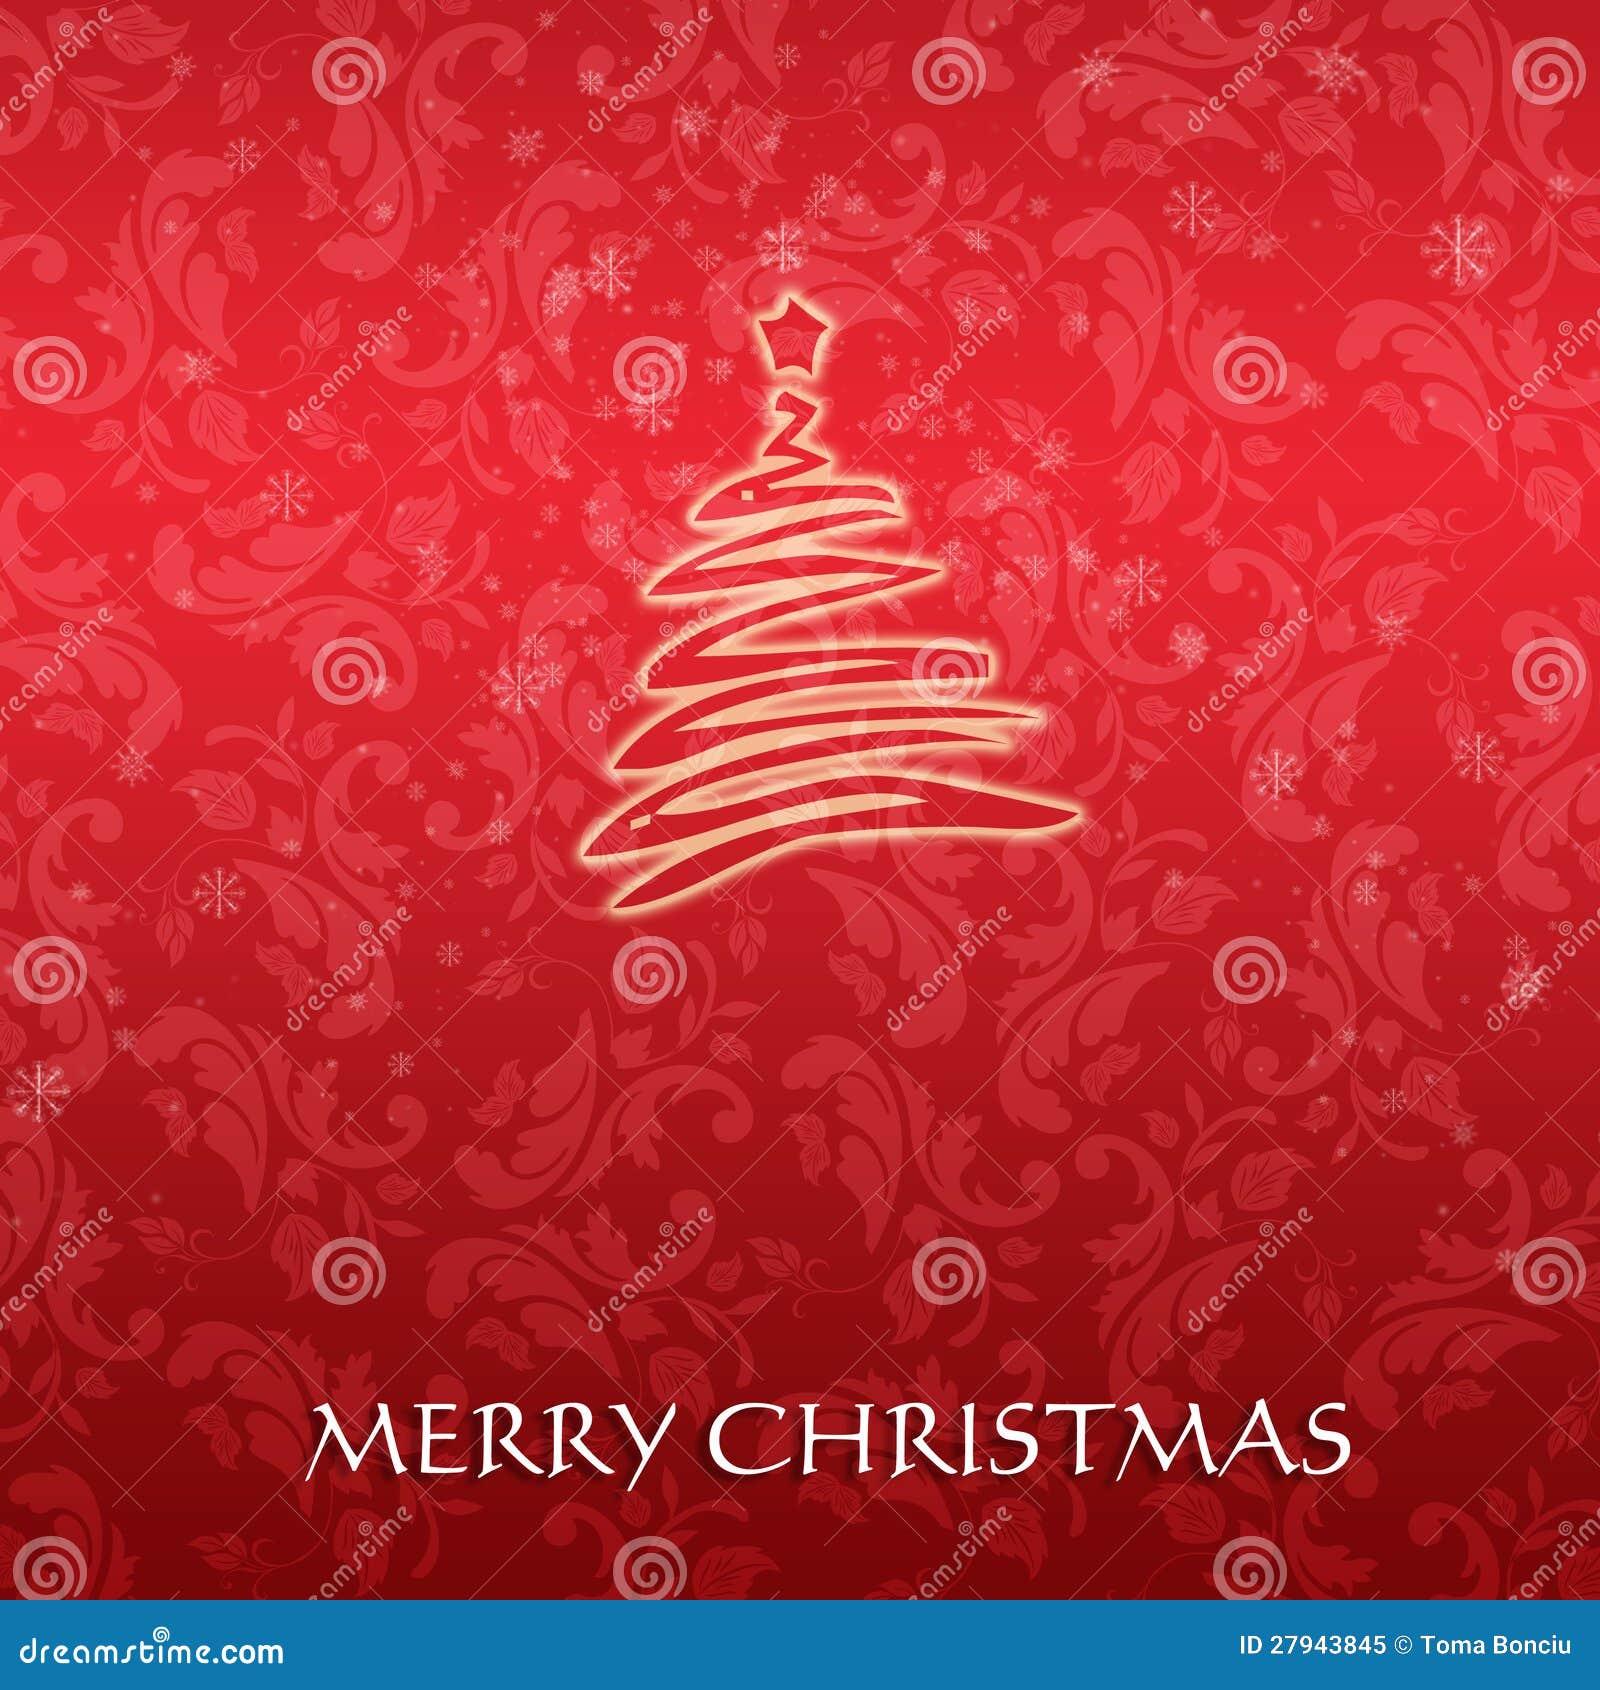 Tarjeta de navidad elegante con un rbol simb lico foto de - Tarjetas de navidad elegantes ...